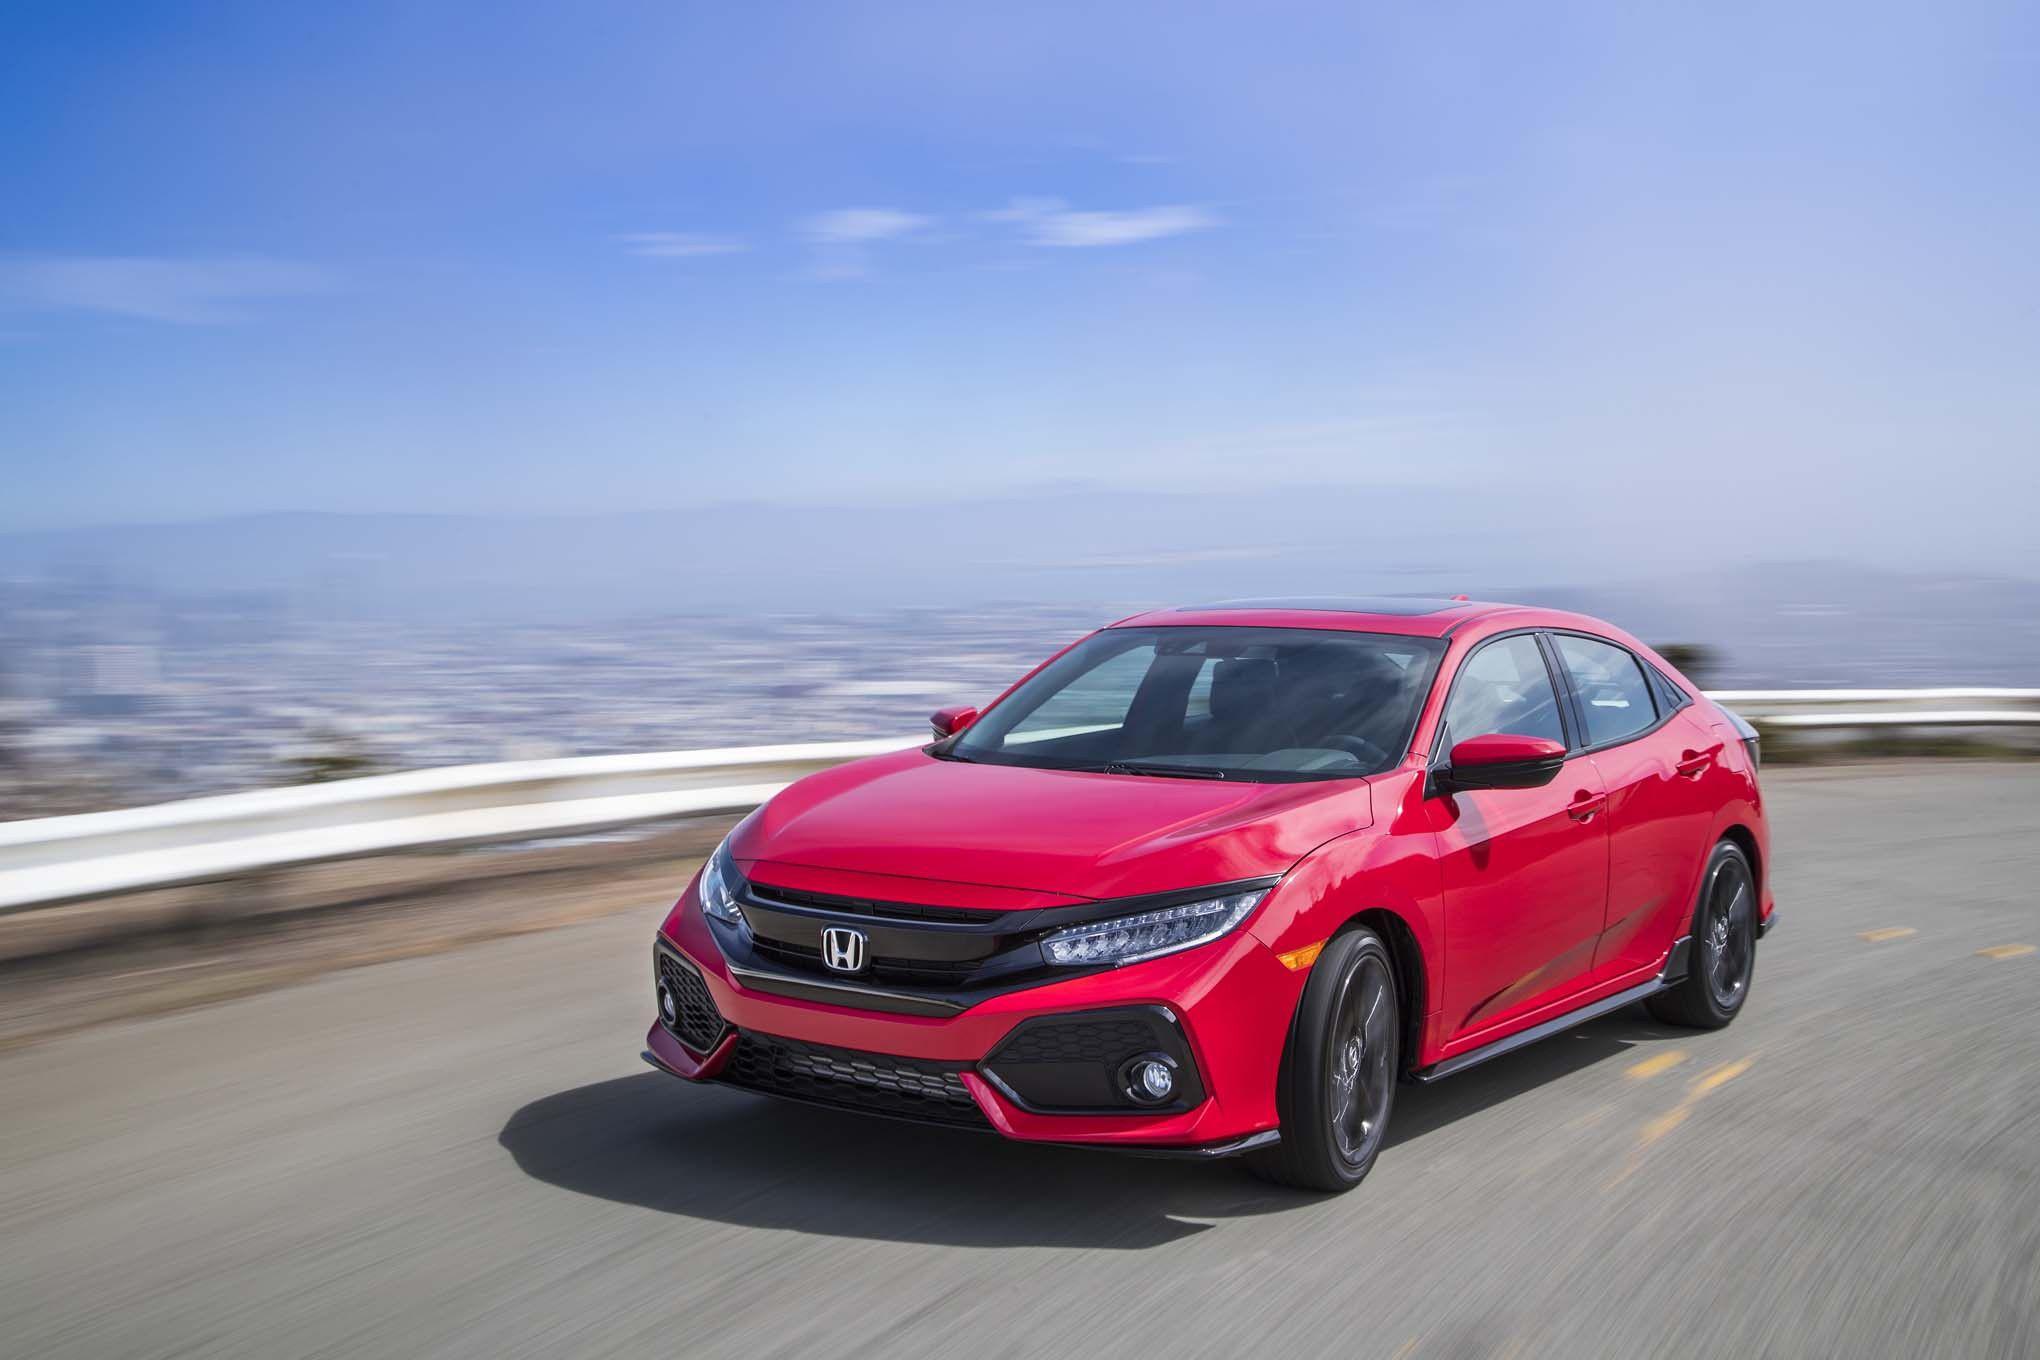 42 2017 Honda Civic Hatchback Sport Xj5s di 2020 Honda